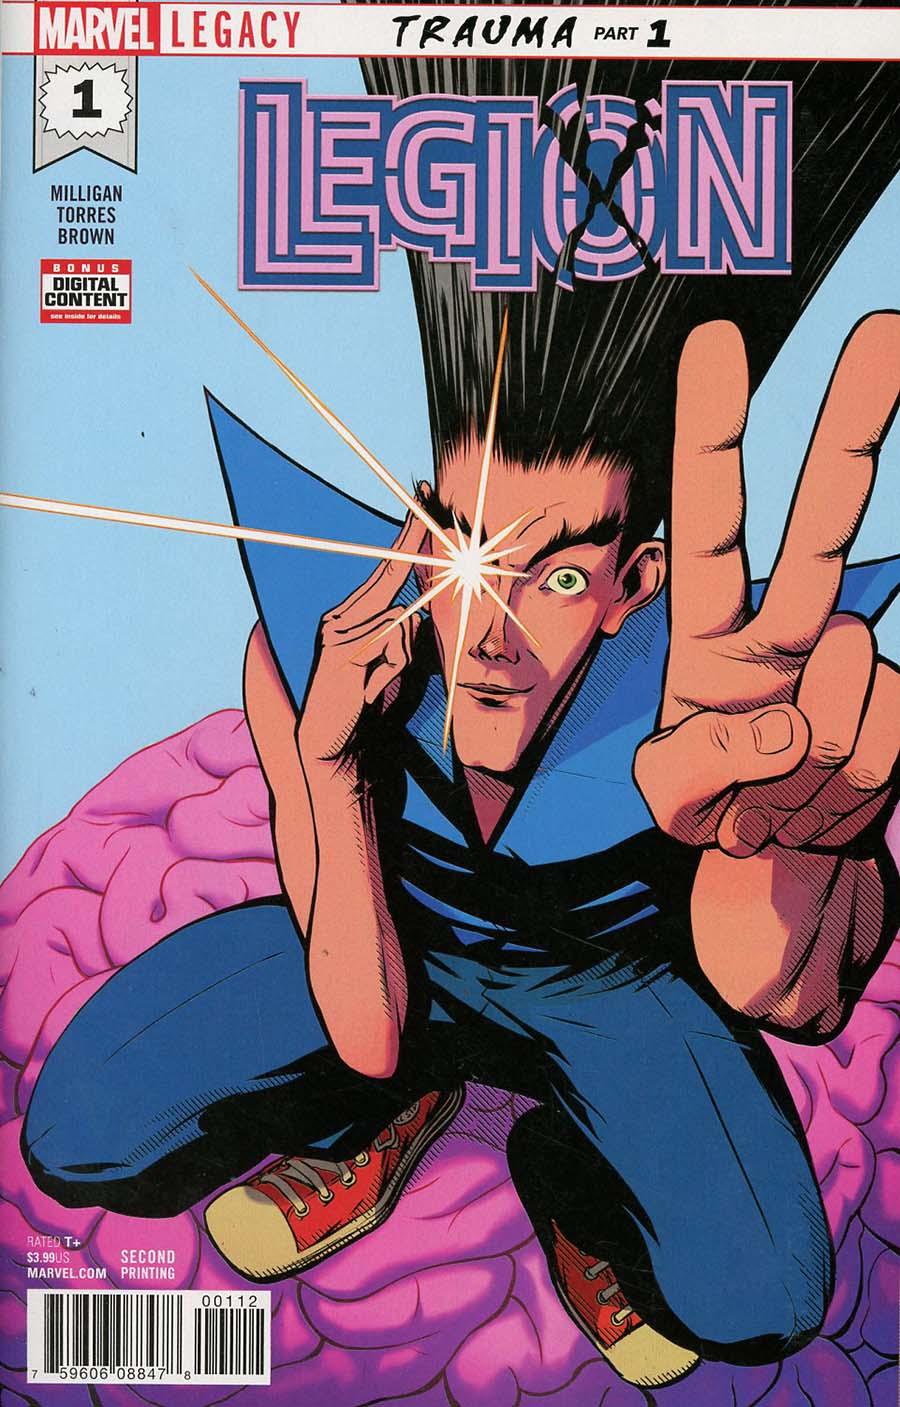 Legion (Marvel) #1 Cover E 2nd Ptg Variant Javier Rodriguez Cover (Marvel Legacy Tie-In)